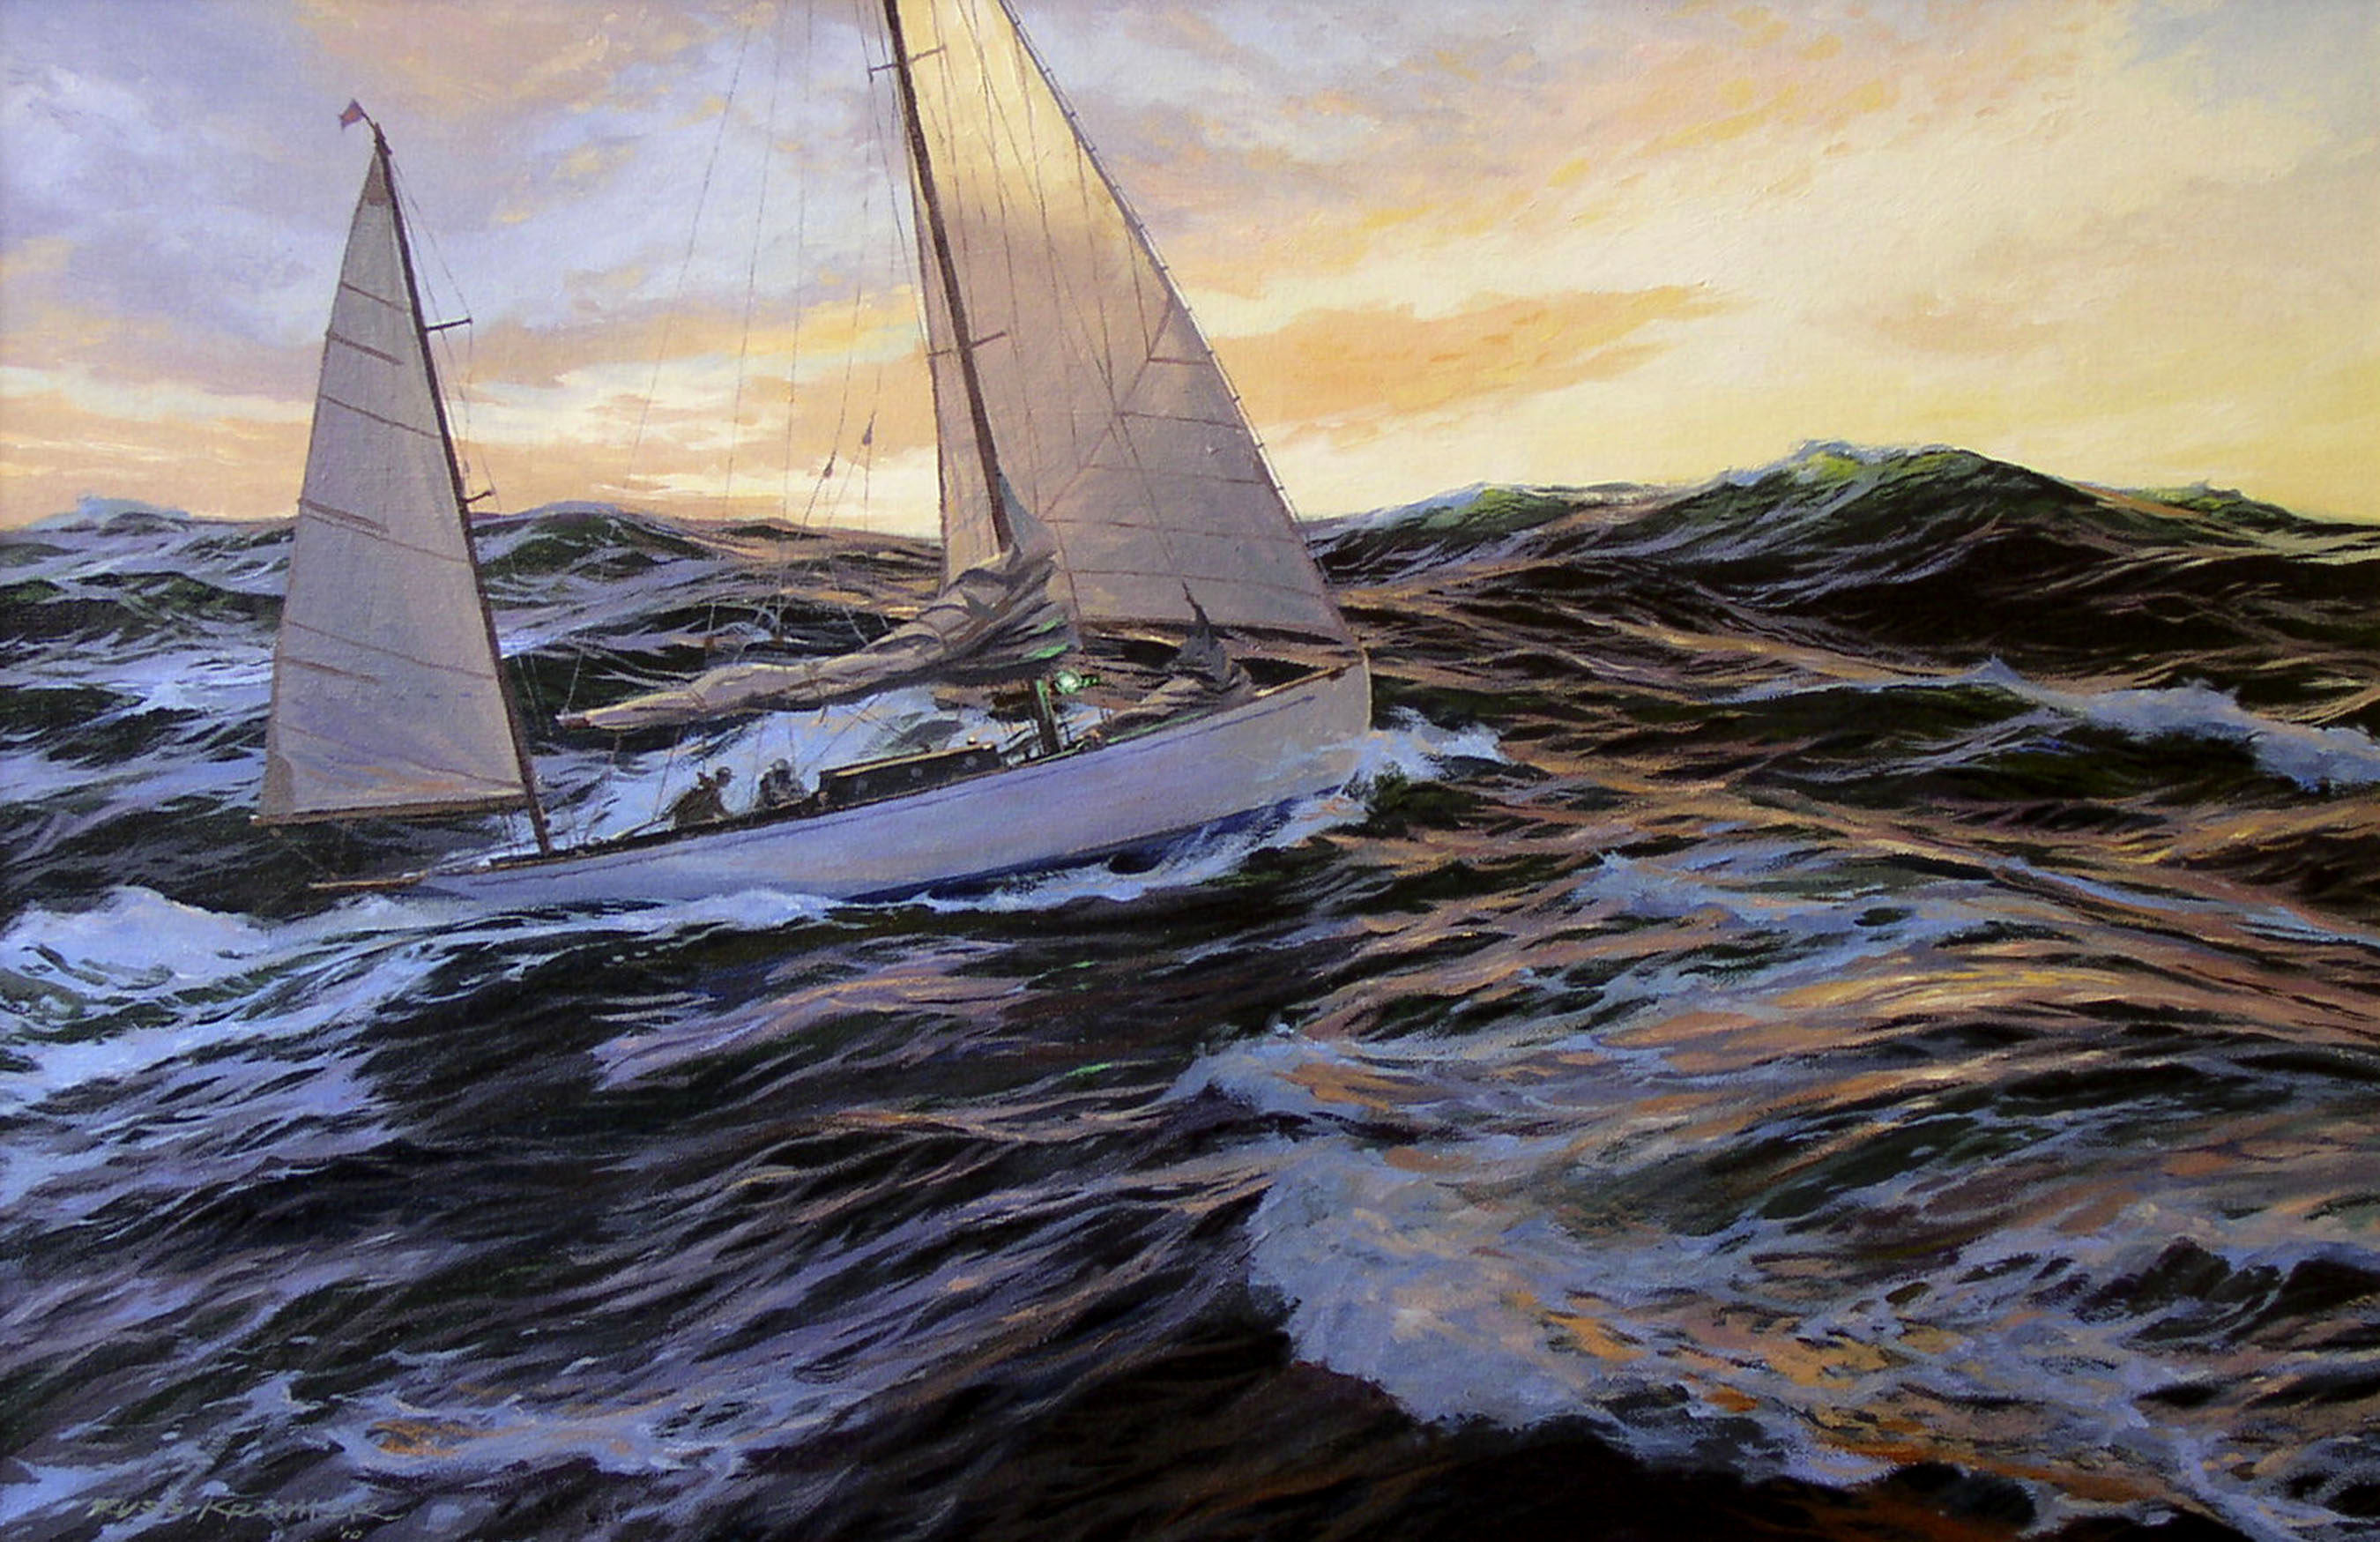 Gallery Russ Kramer Marine Artist